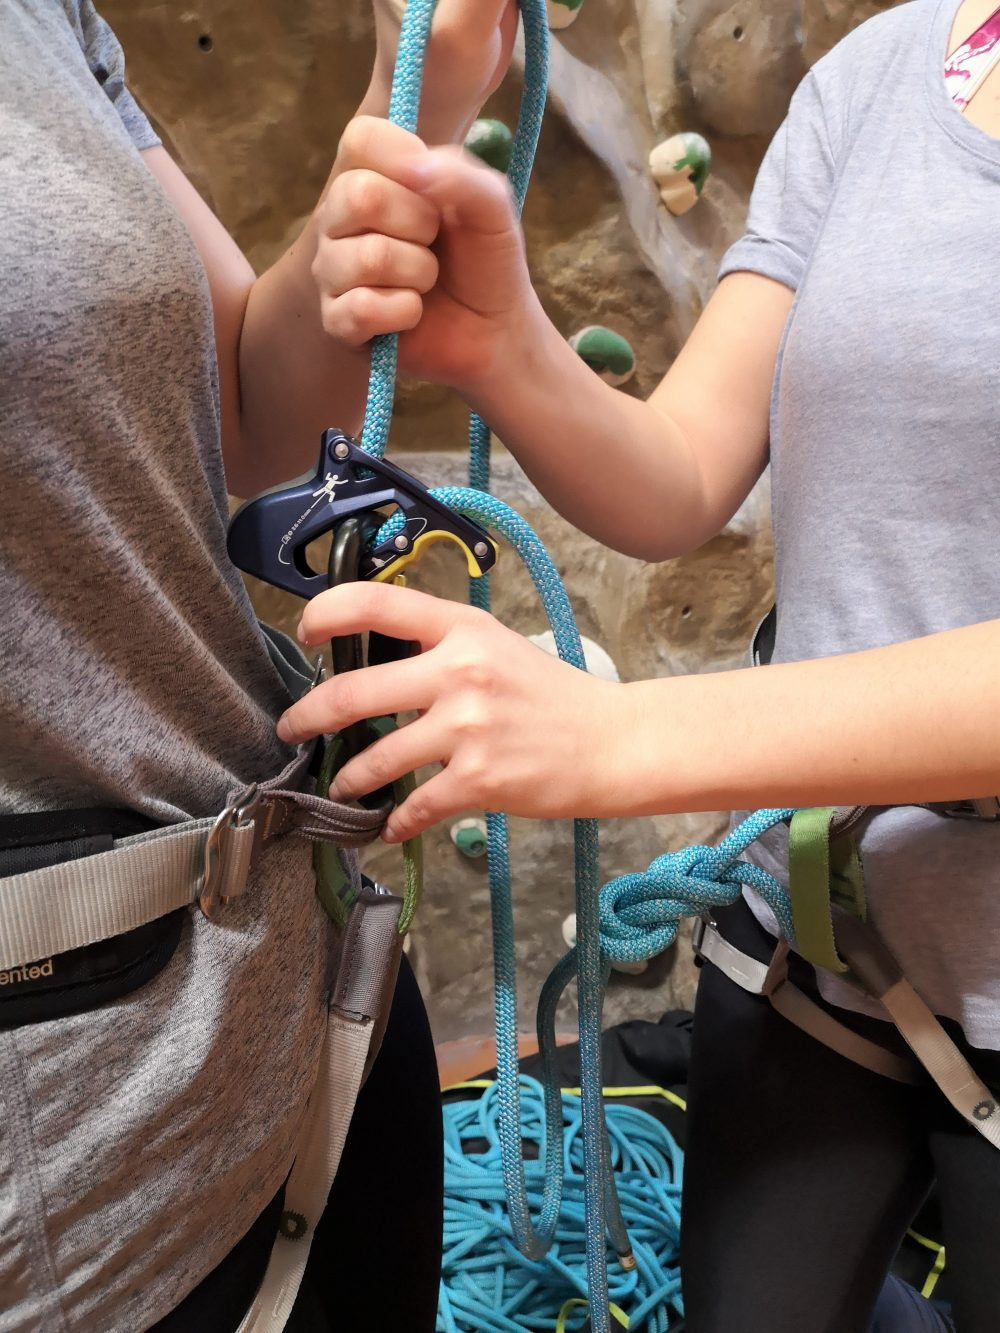 Kletterkurs Vorstieg Spotten